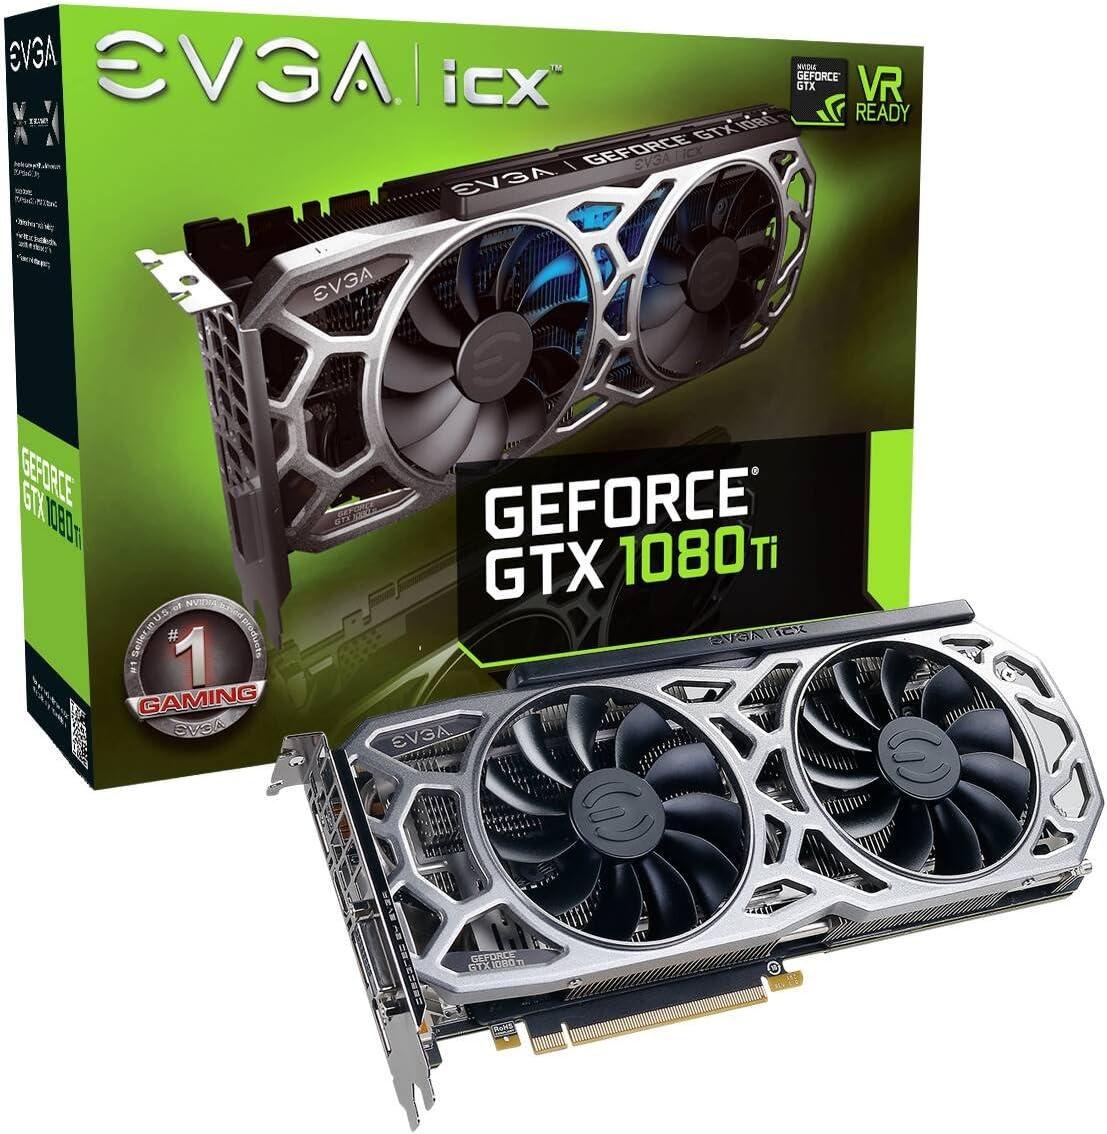 EVGA GeForce GTX 1080 Ti Gaming 11GB GDDR5X iCX Technology - 9 Thermal Sensors & RGB LED G/P/M Graphic Cards (11G-P4-6591-KR)